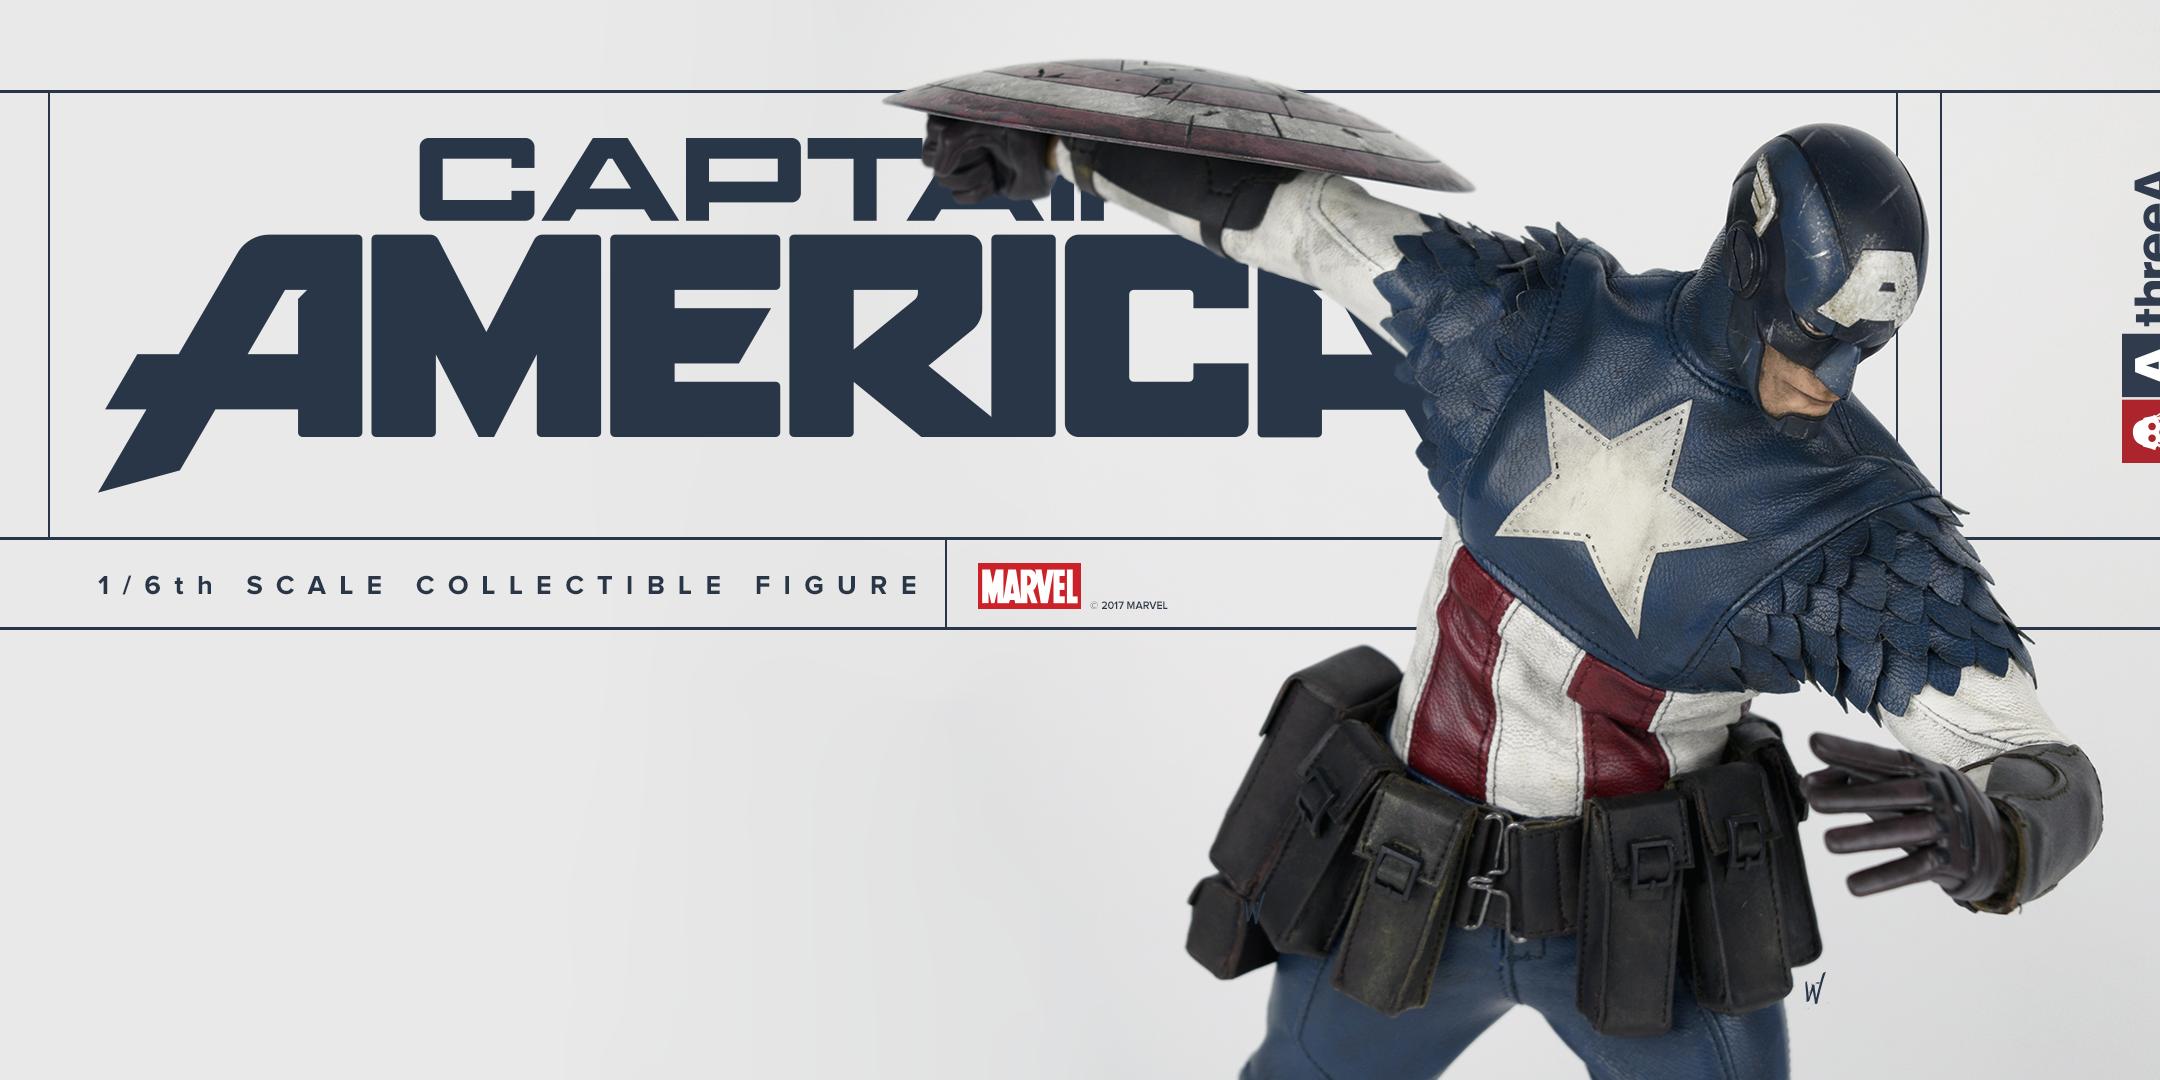 3A_Marvel_CaptainAmerica_Landscape_Ad_003.png